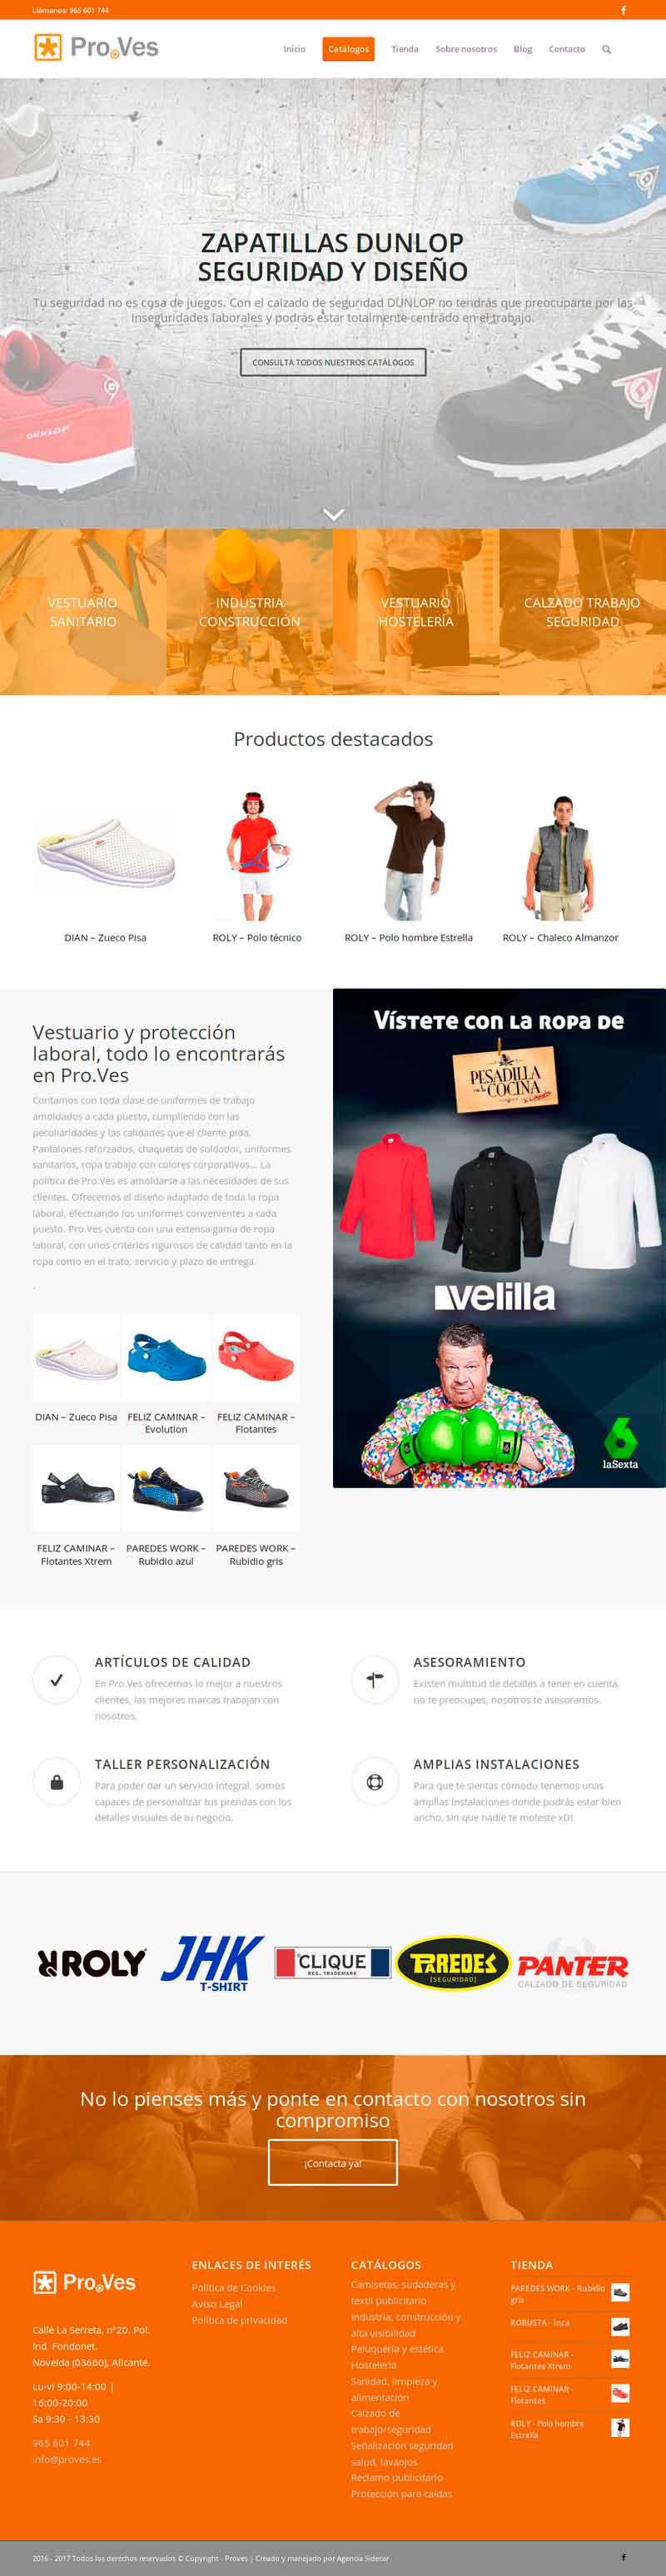 Agencia Sidecar agencia-sidecar-portfolio-proves-1 Pro.Ves